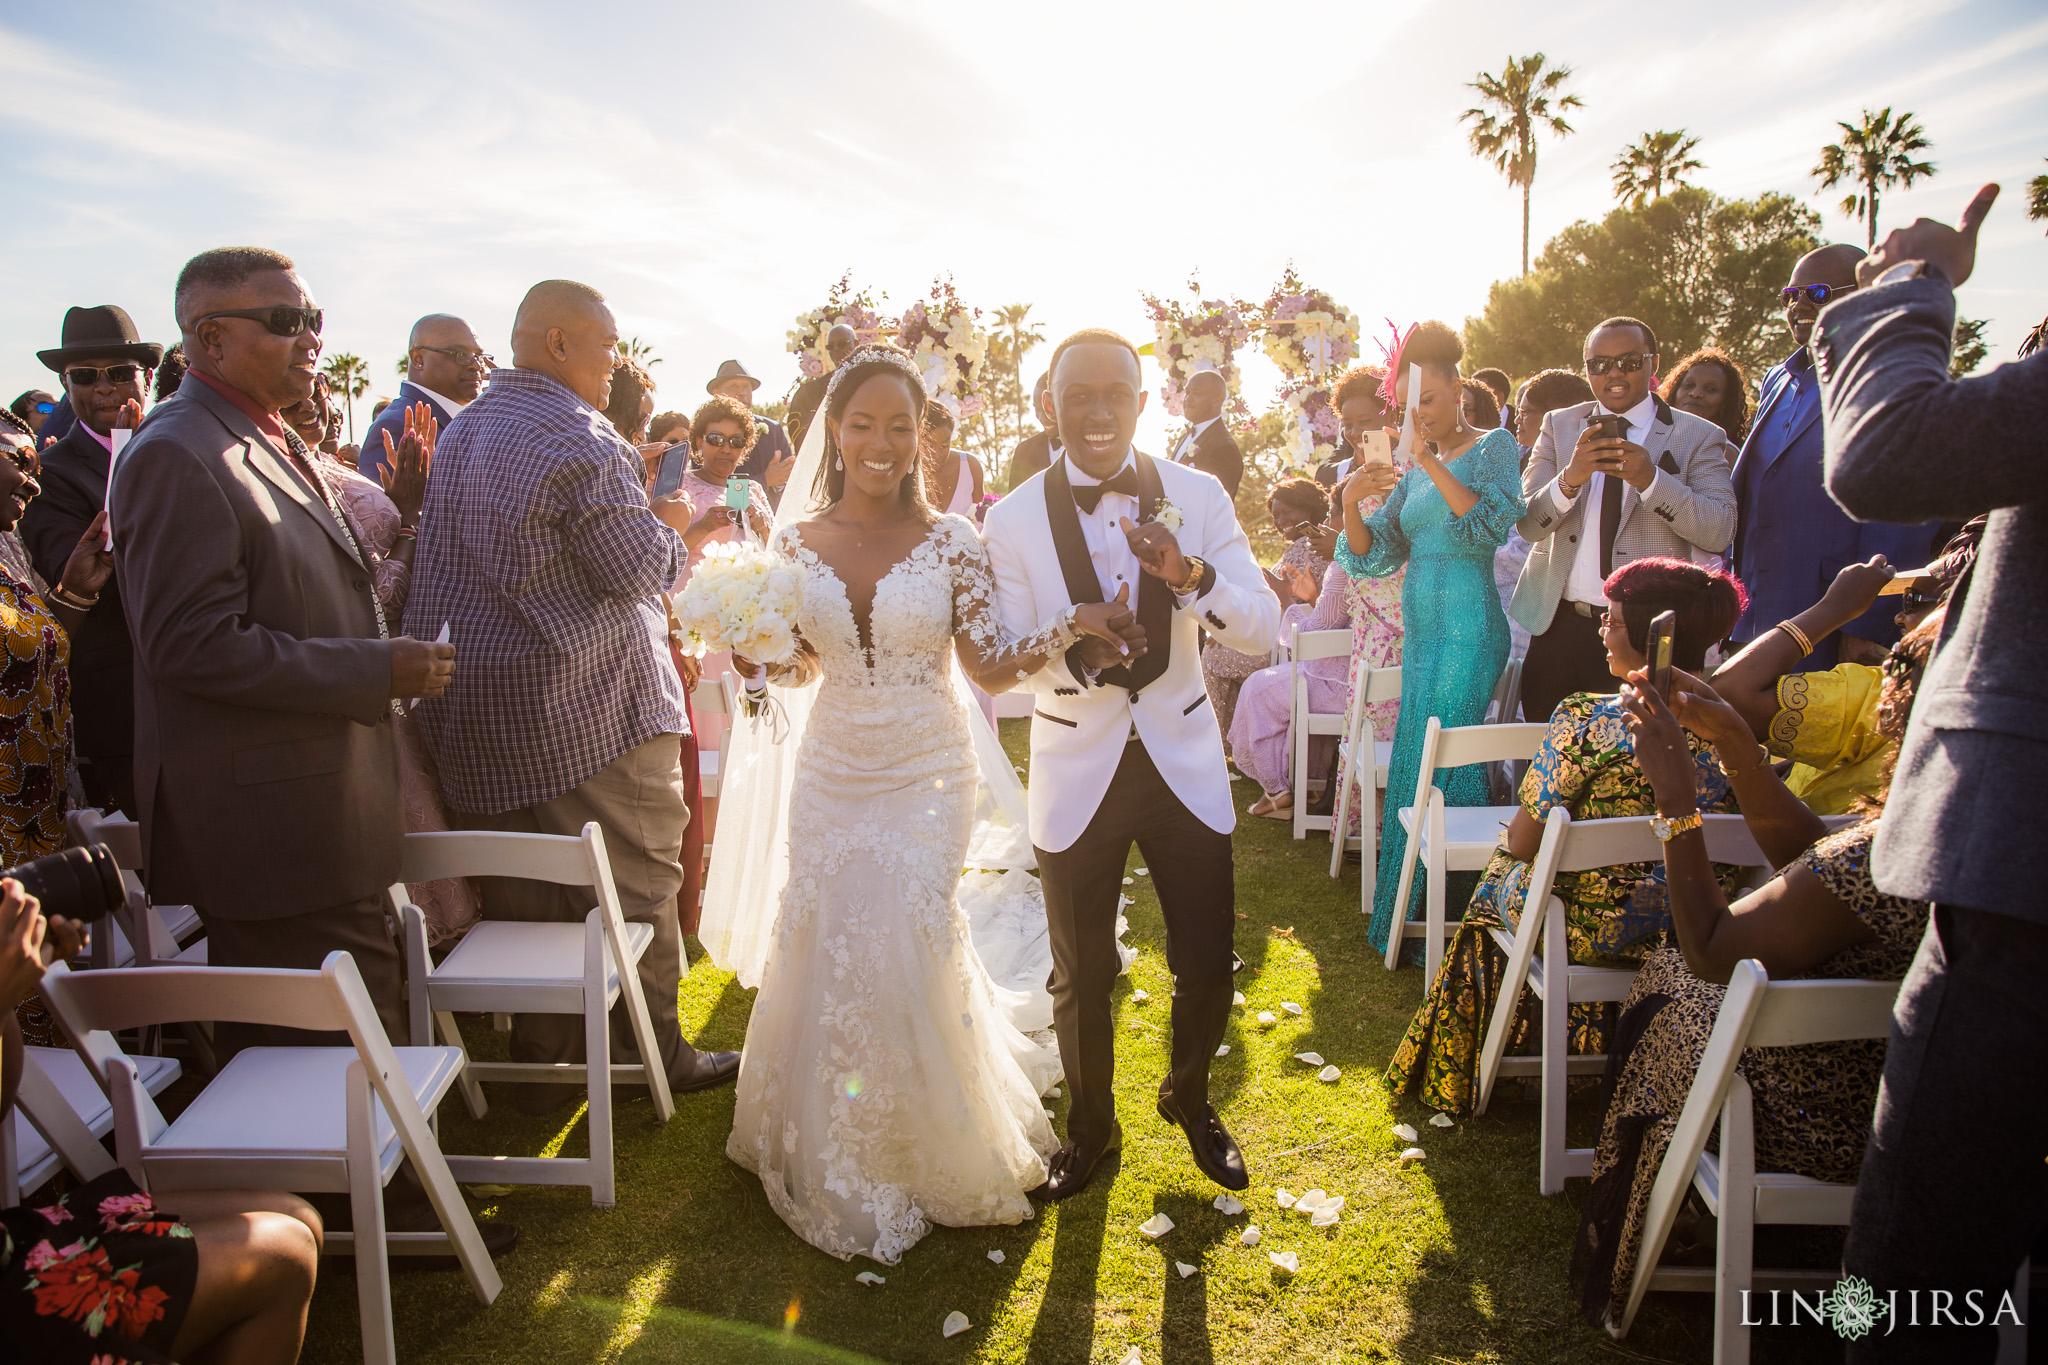 25 Los Verdes Golf Course Palos Verdes Kenyan Wedding Photography